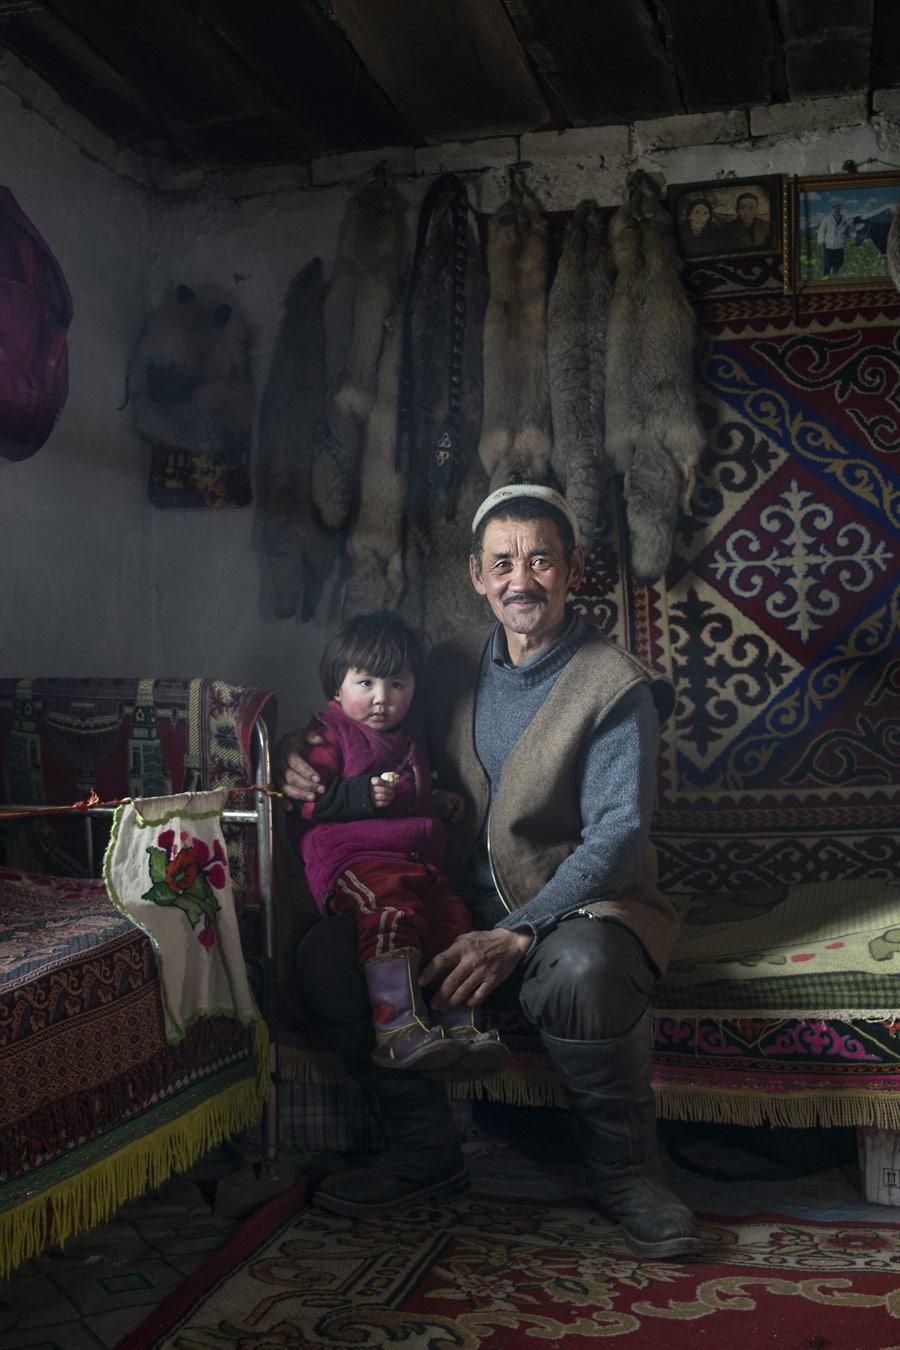 Boldeken (The Eagle Hunter), © Dimitri Staszewski, Philadelphia, PA, United States, Amateur : Travel Portraits, World In Focus - The Ultimate Travel Photography Competition